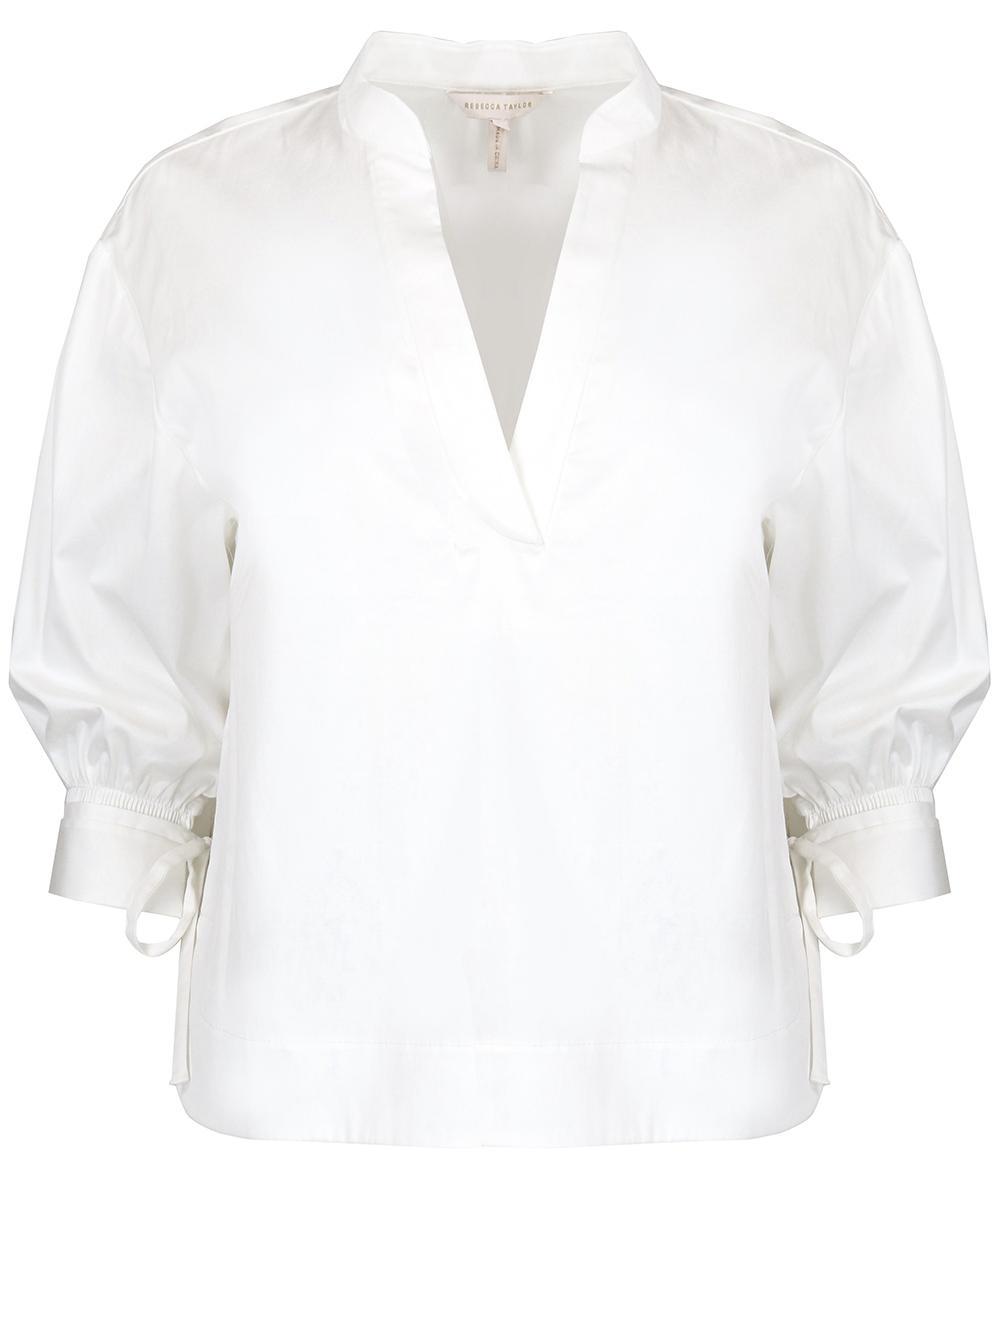 Short Sleeve Twill Blouse Item # 121135B686